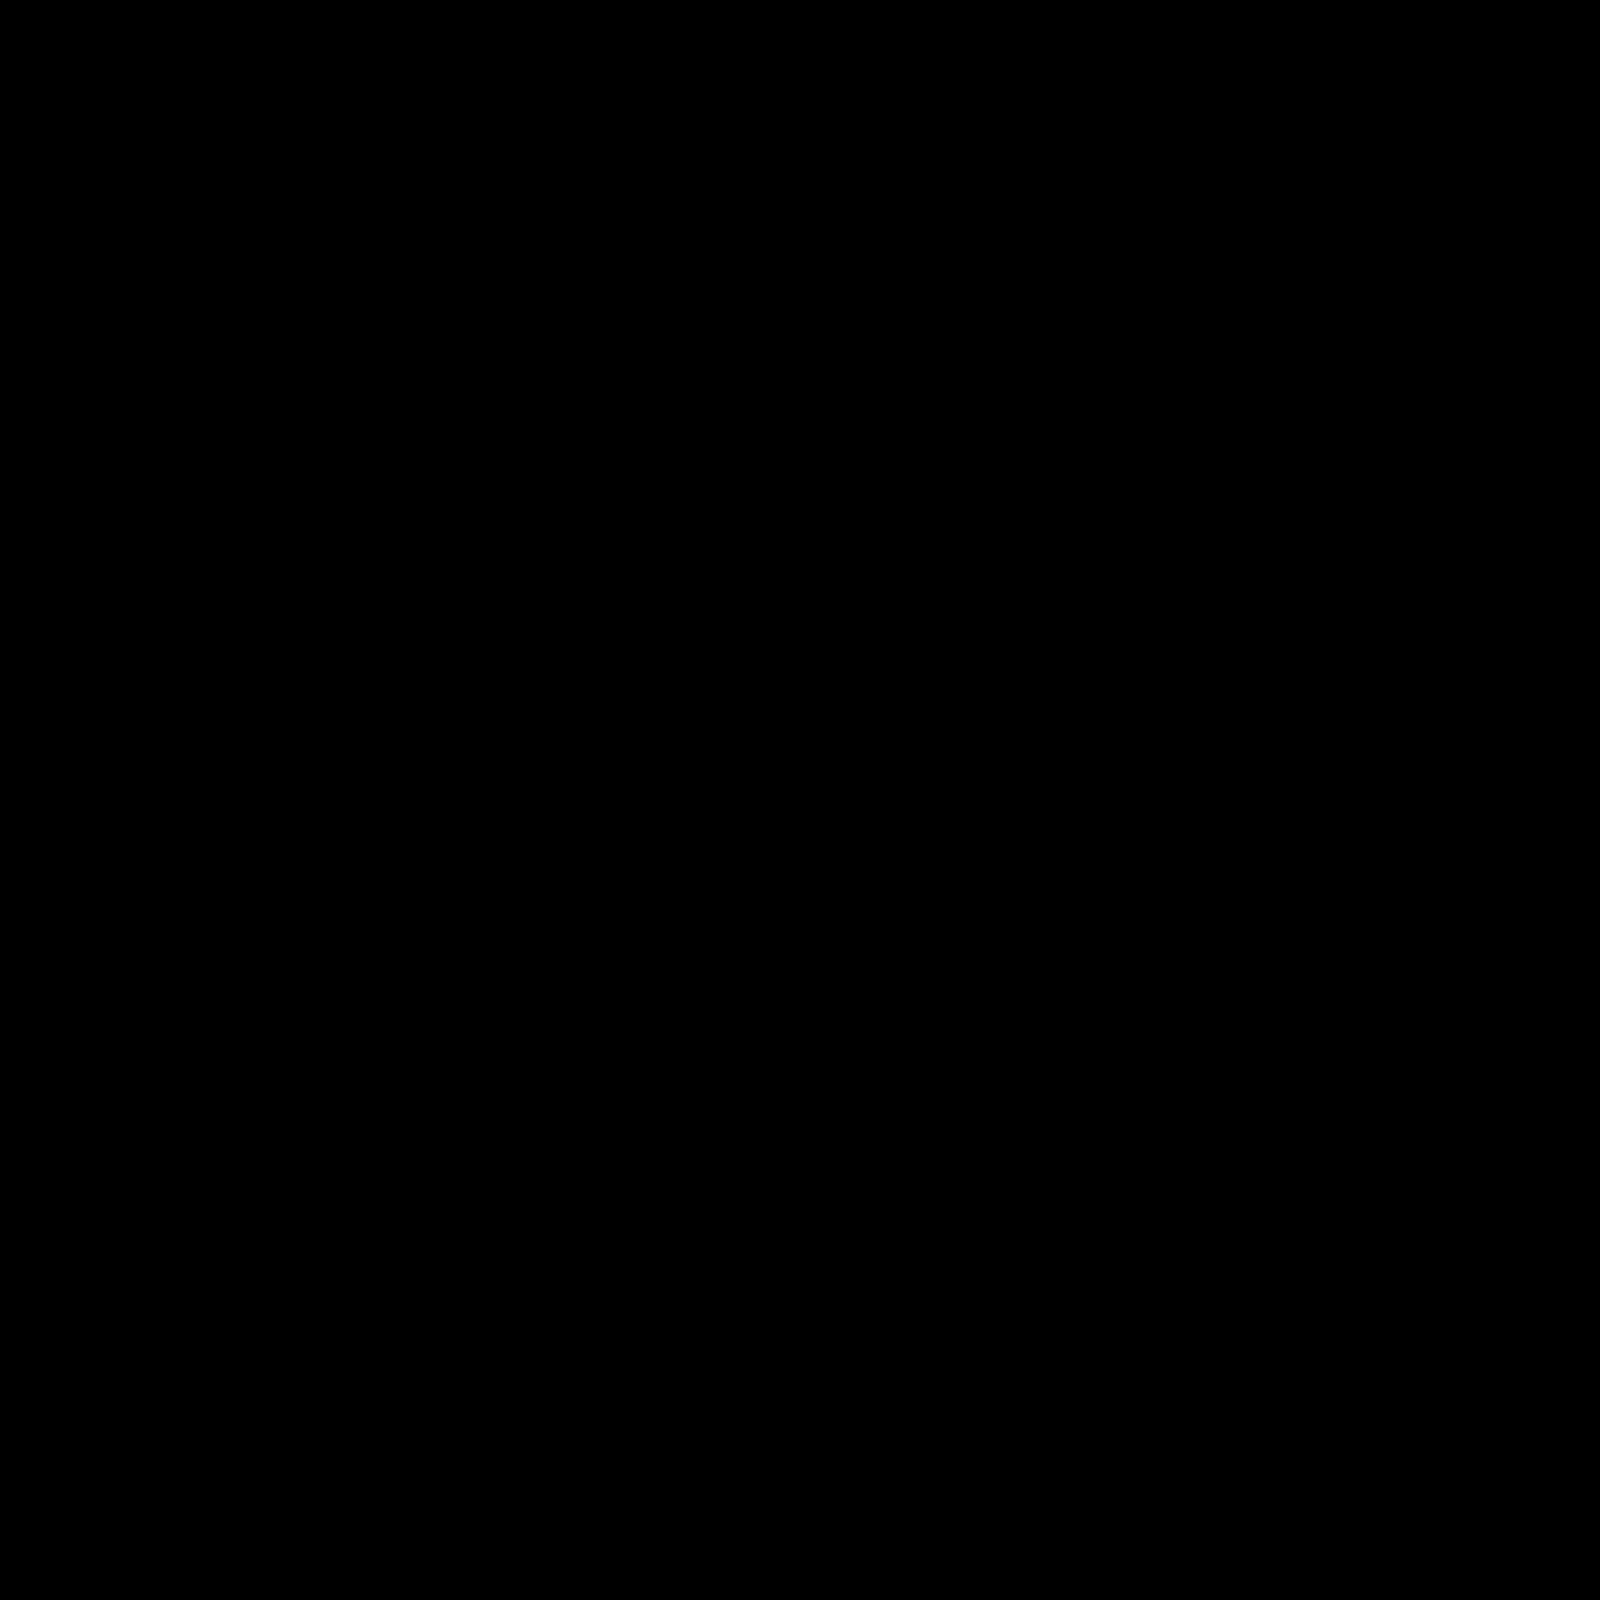 Syringe PNG Black And White - 60779